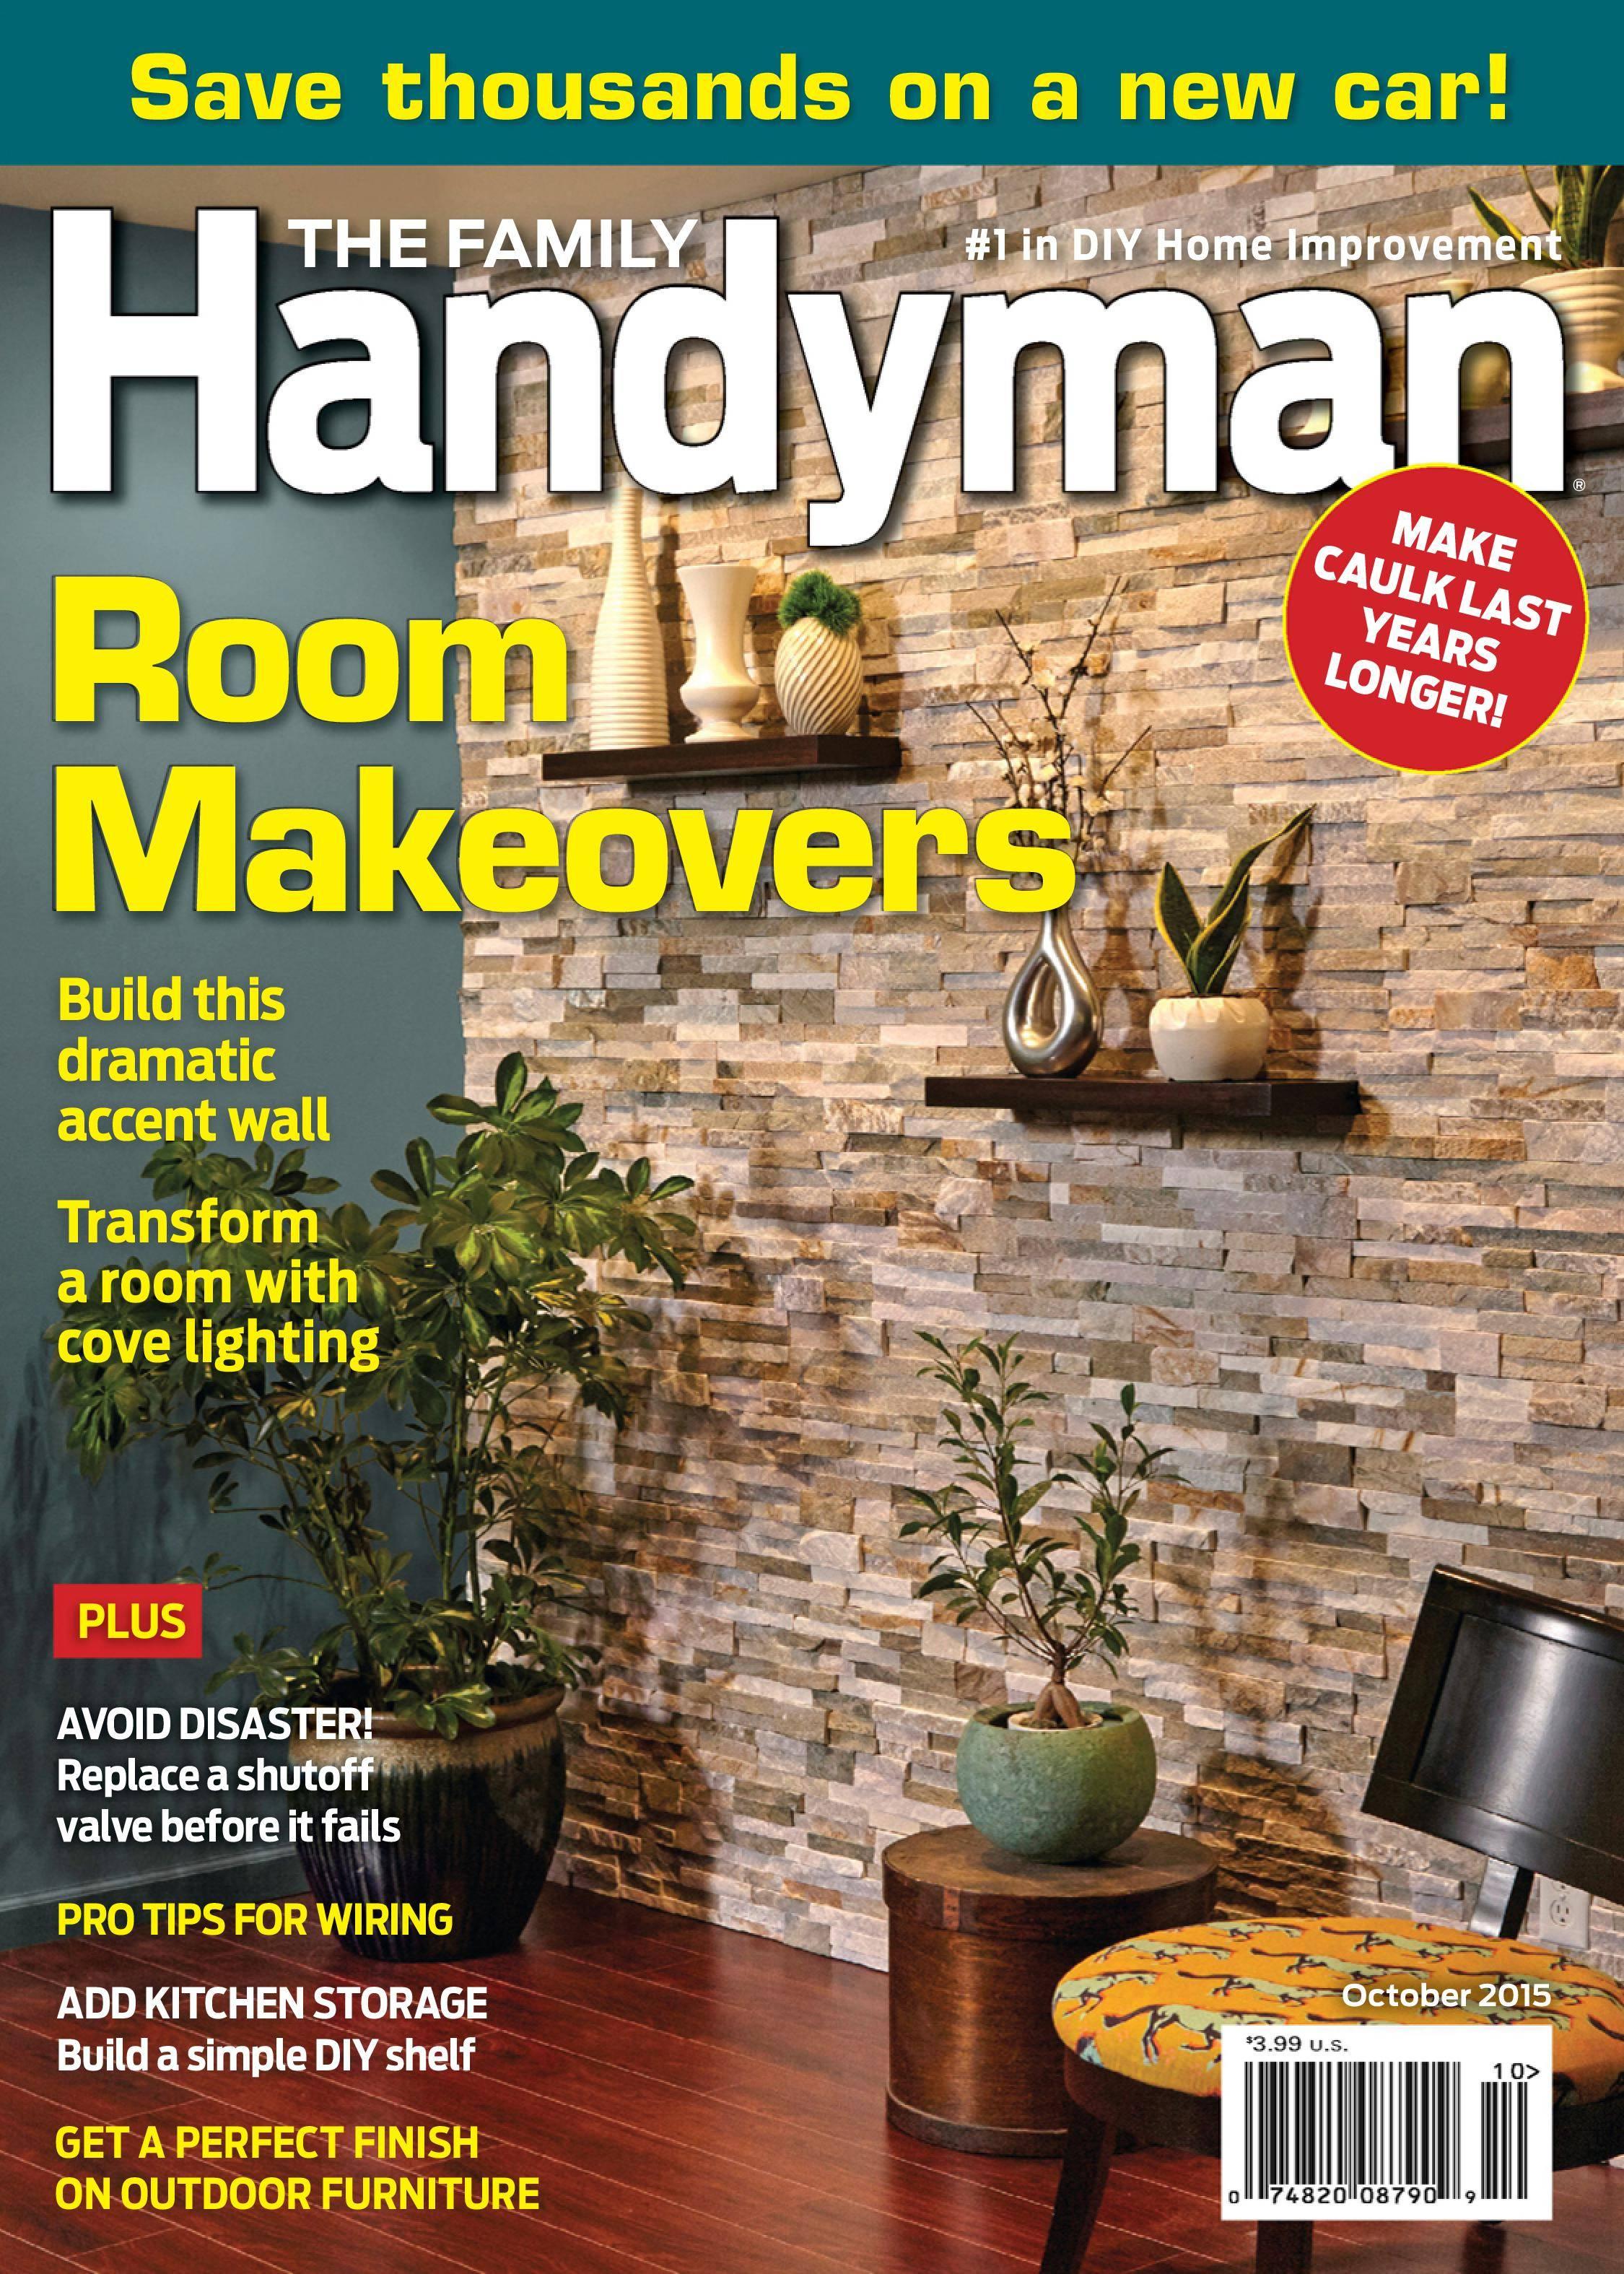 Family Handyman - October 2015